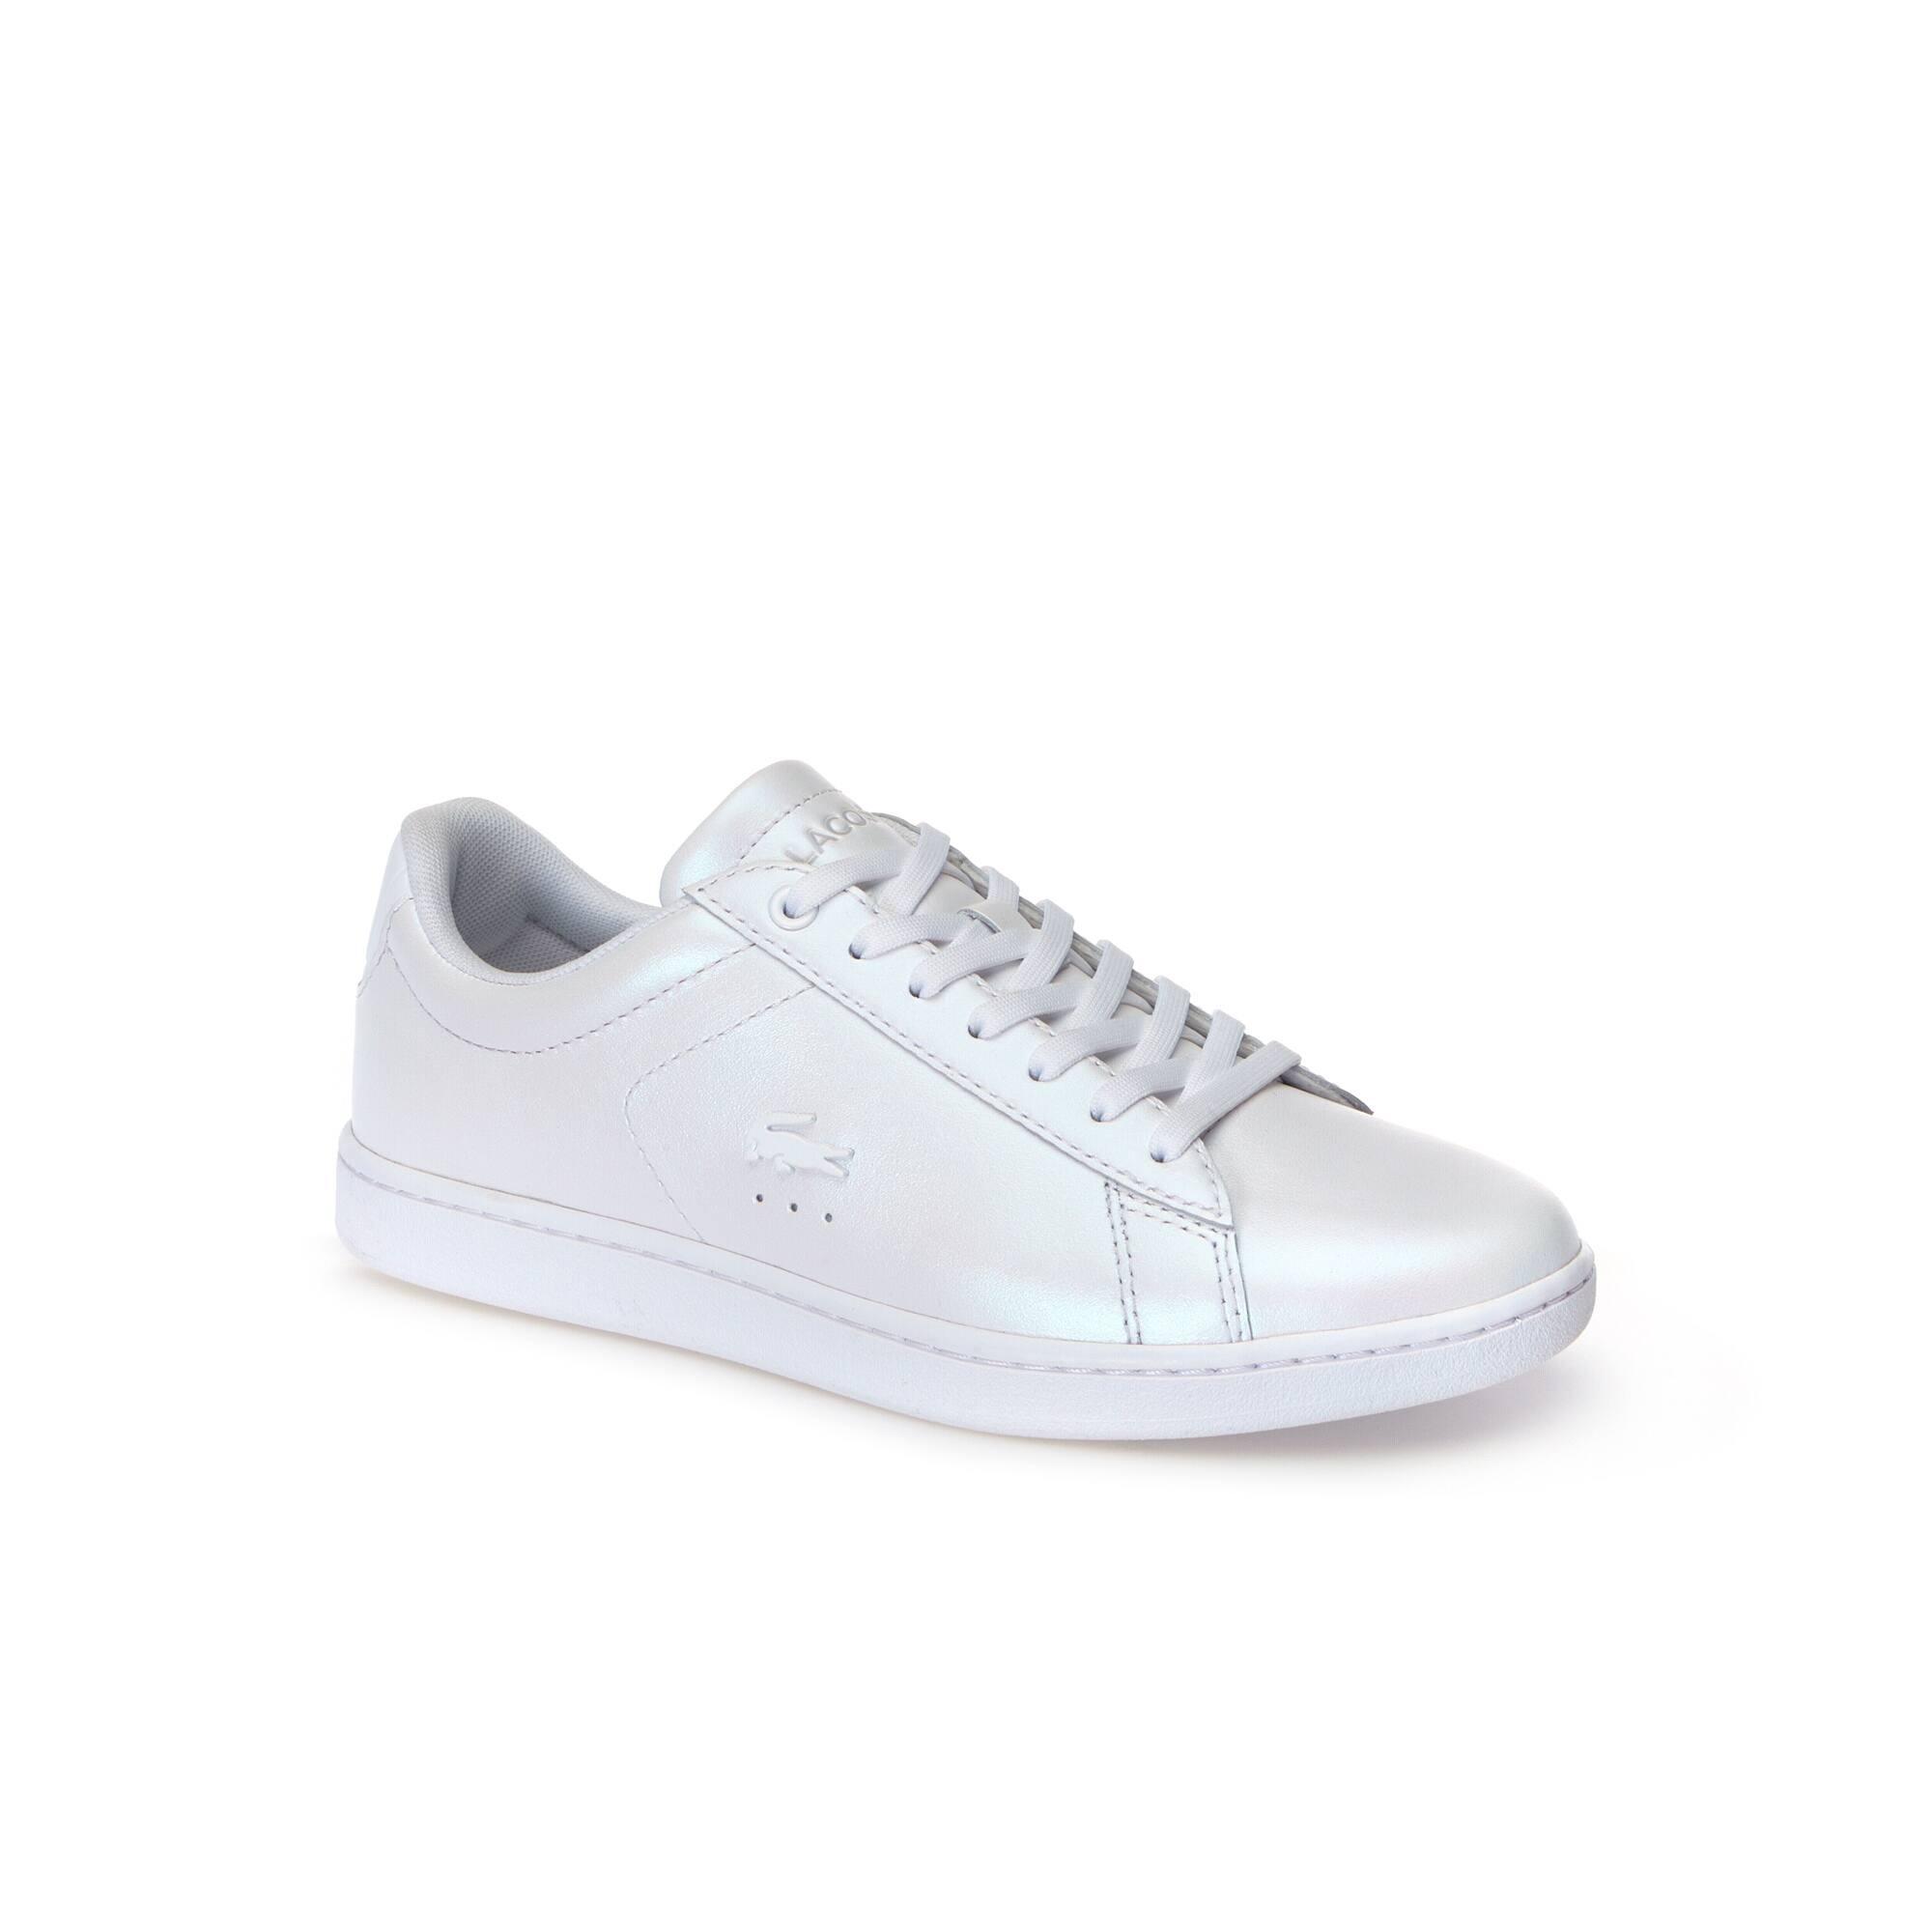 Toutes Les Toutes Chaussures Toutes Lacoste Chaussures Toutes Les Lacoste Lacoste Les Chaussures XqCOcFw4